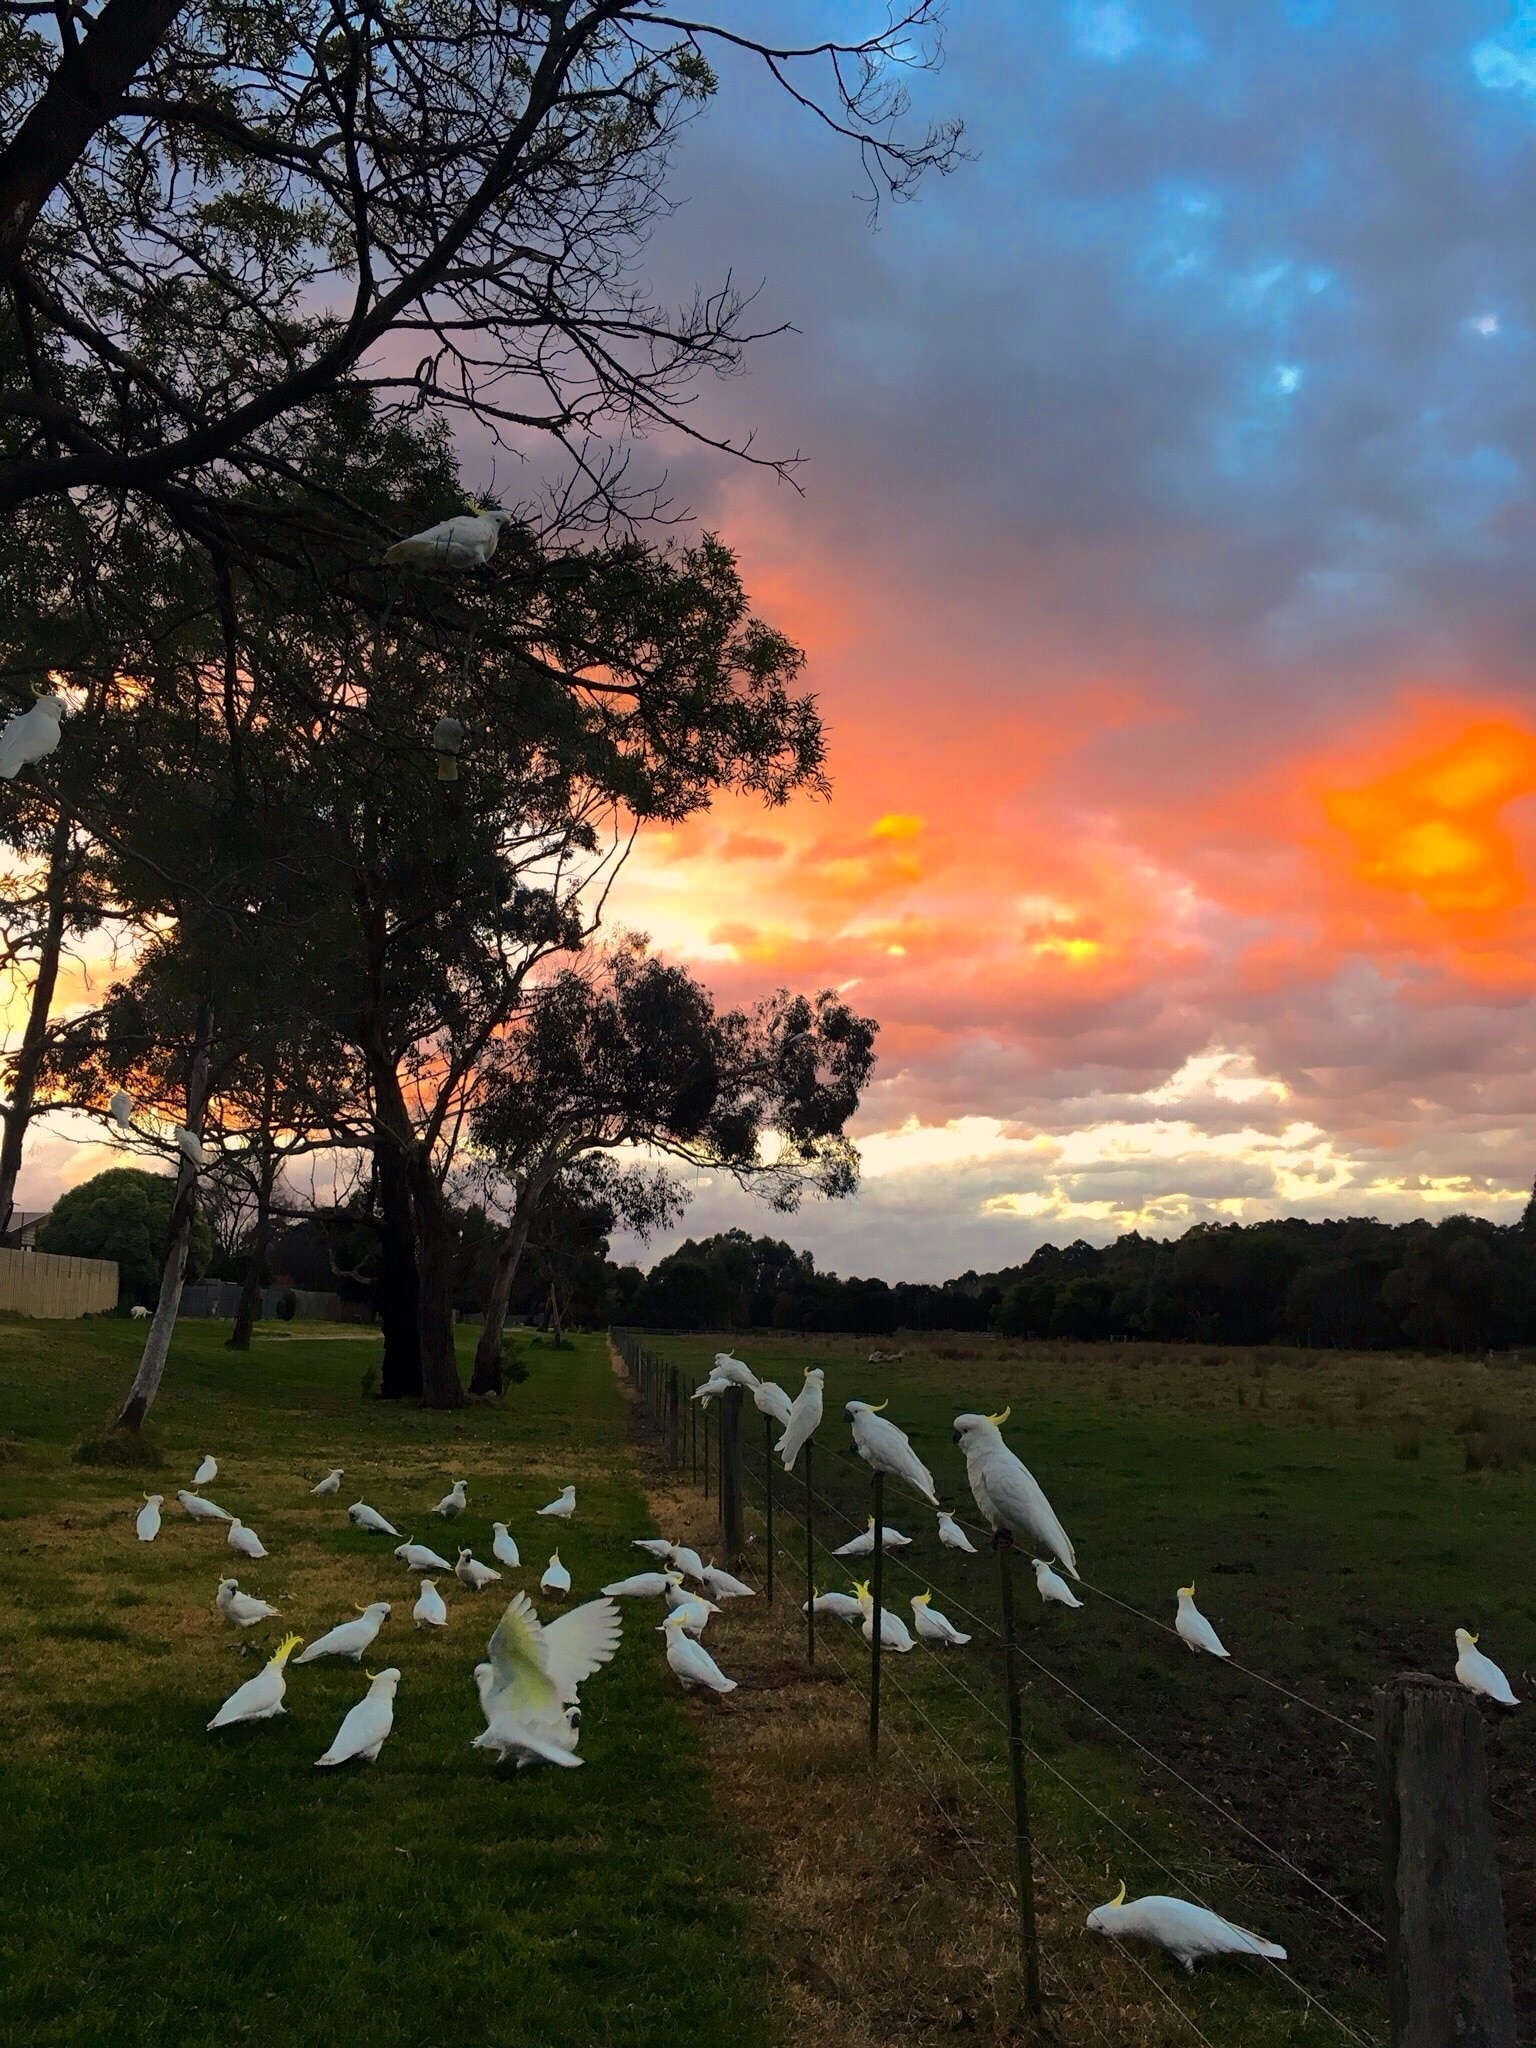 Glen Waverley, Melbourne, Victoria, Australia